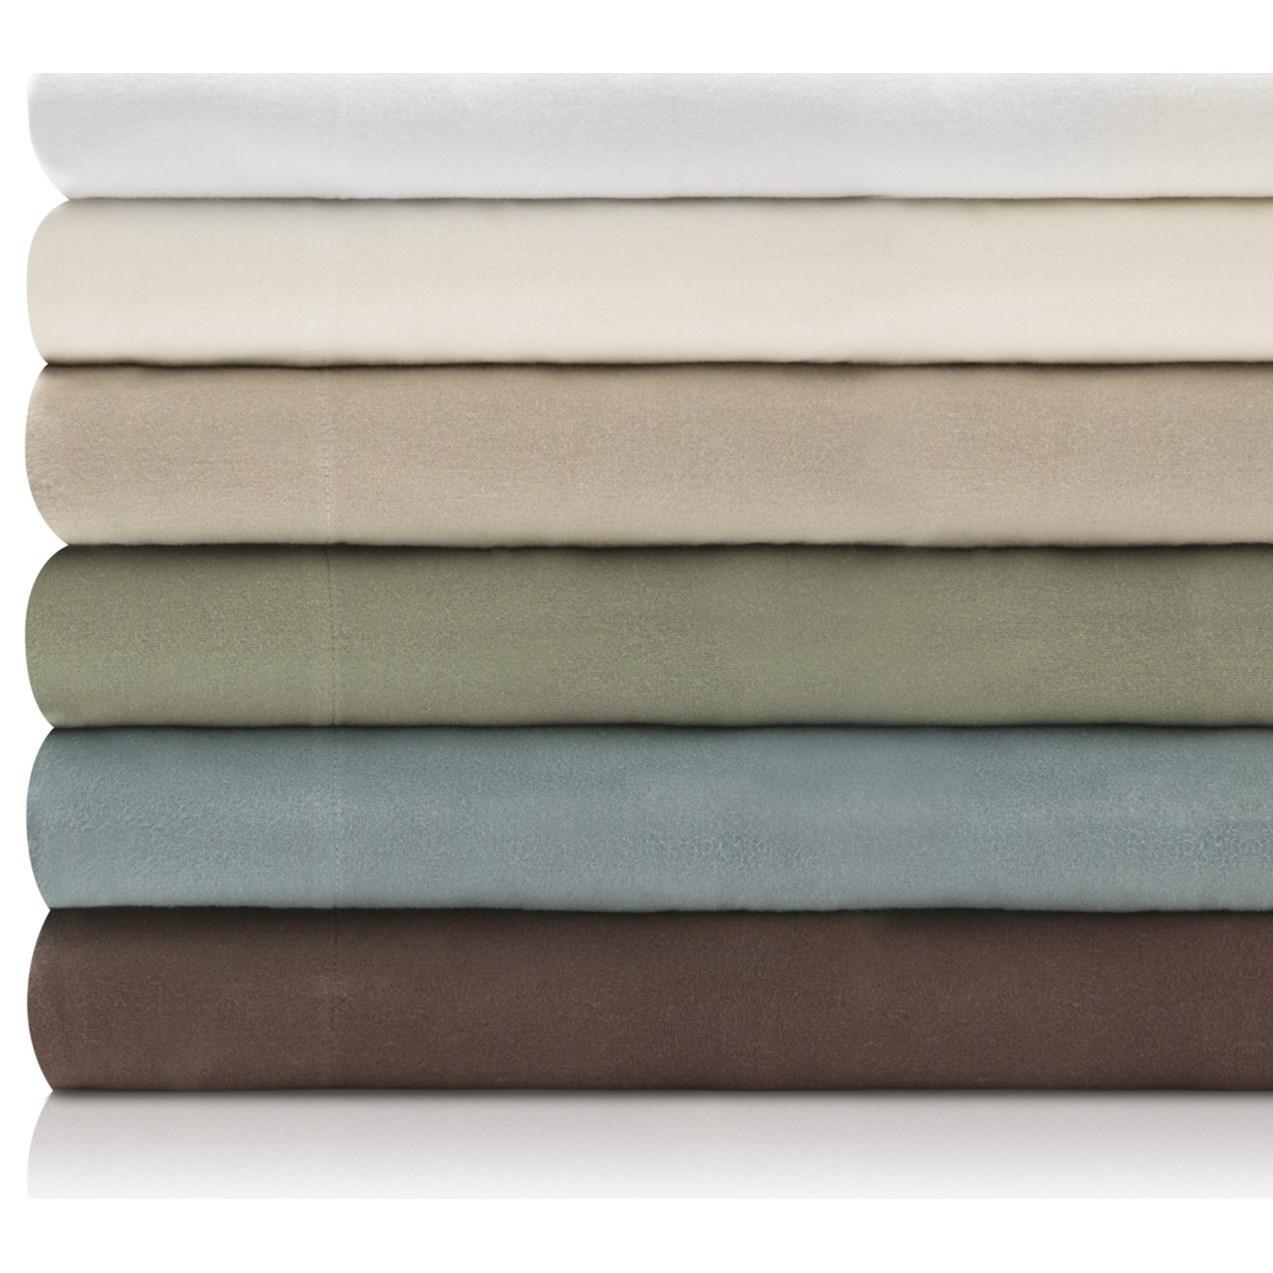 Malouf Portuguese Flannel Queen Woven™ Portuguese Flannel Sheet Set - Item Number: WO19QQPNFS